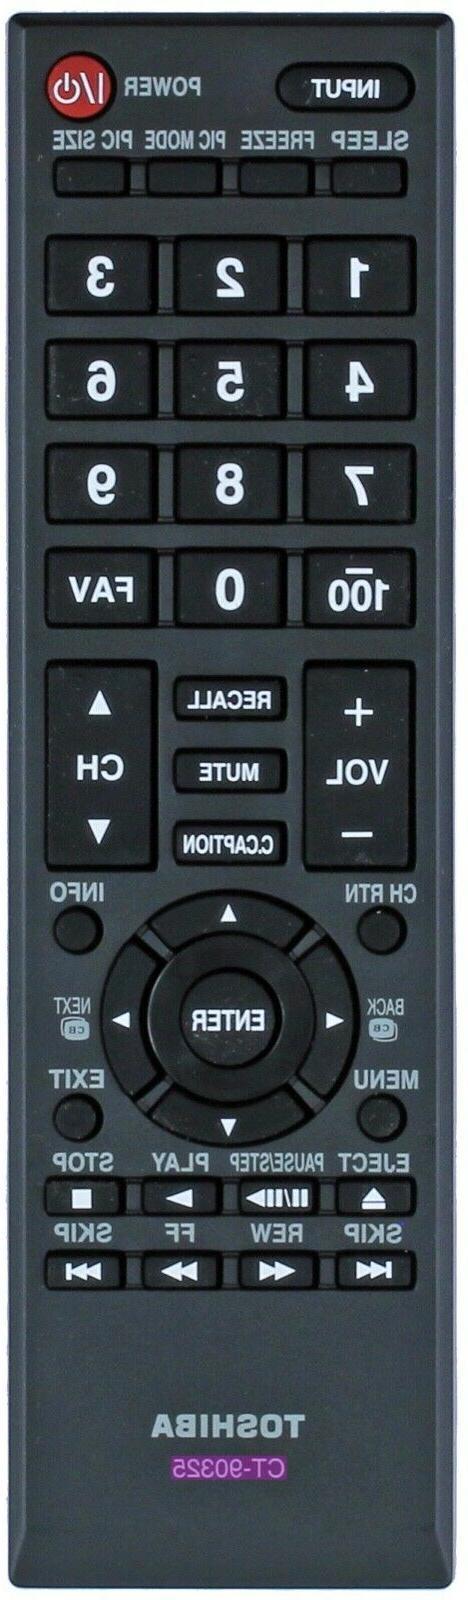 original tv remote control ct 90325 32c100u2